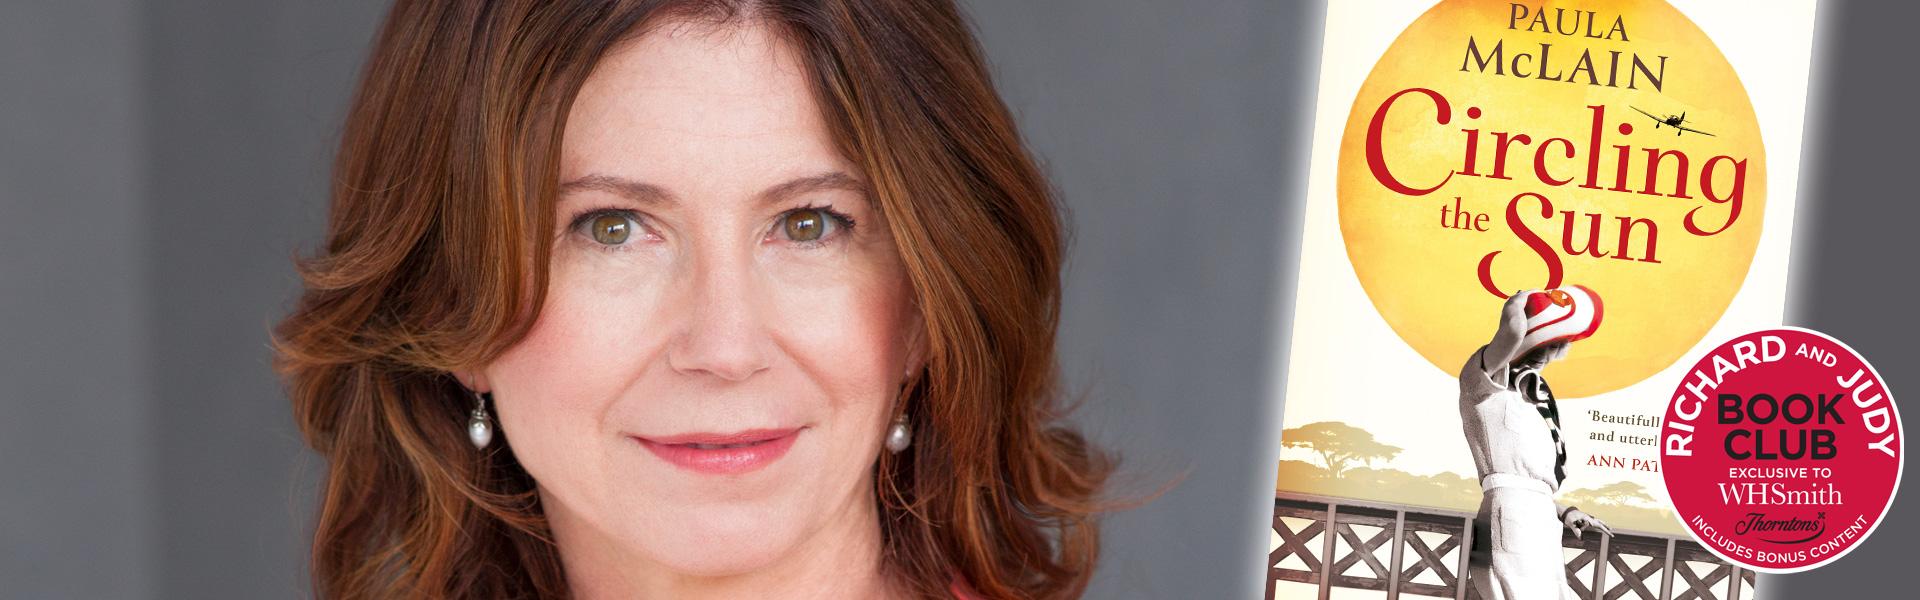 Richard and Judy Interview: Paula McLain on Circling the Sun